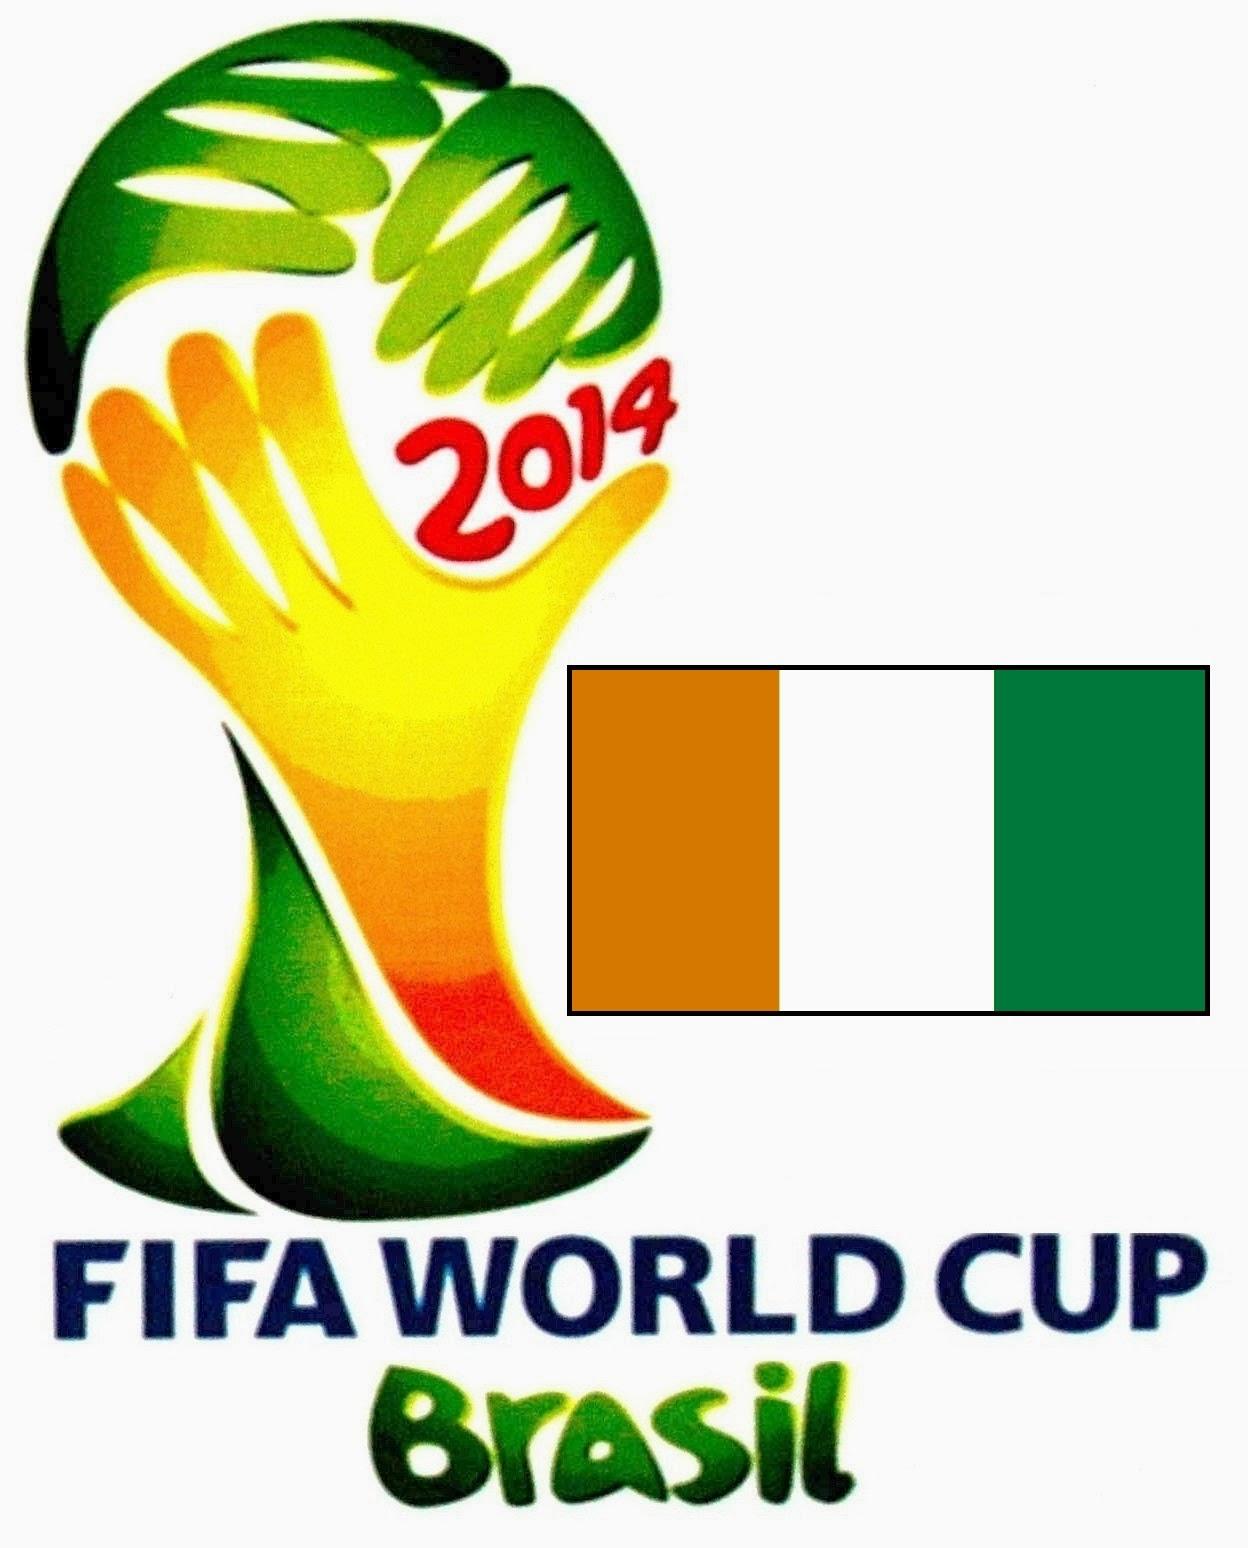 Daftar Nama Pemain Timnas Pantai Gading Piala Dunia 2014